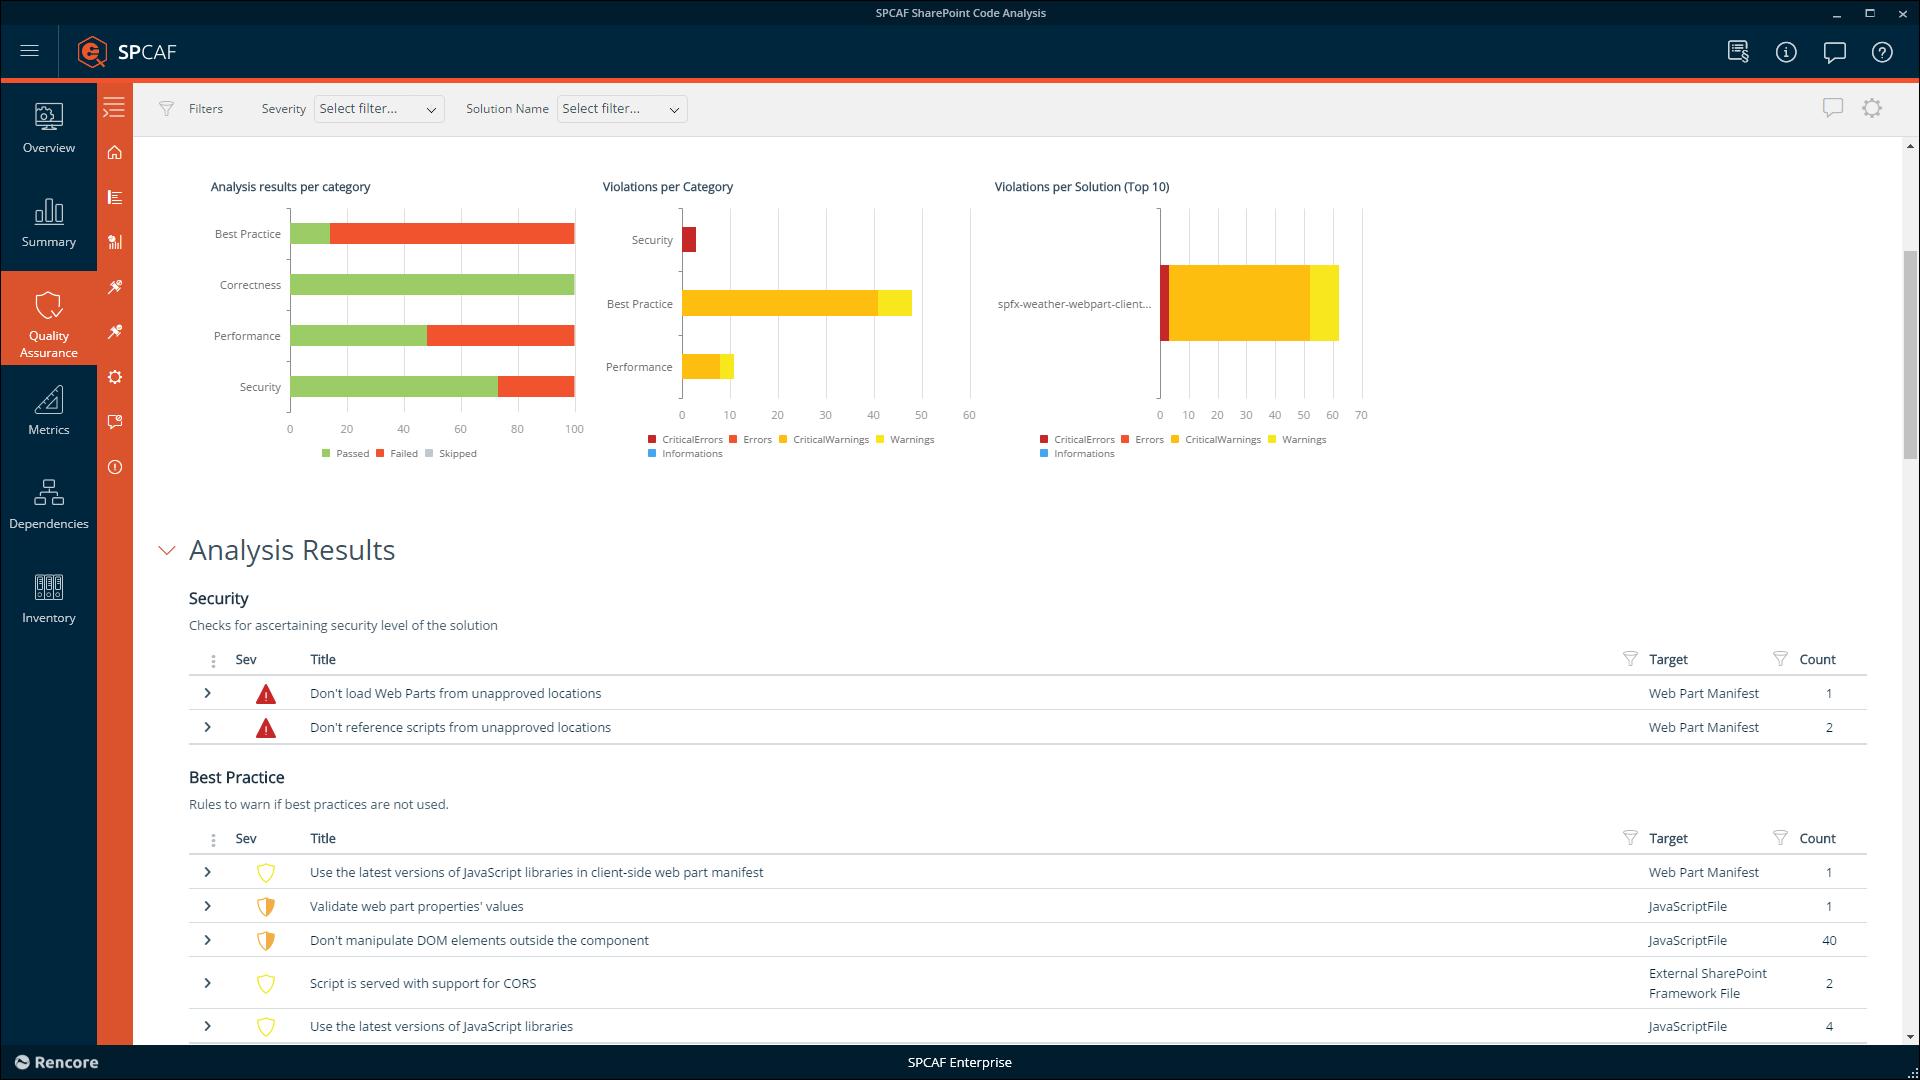 SPCAF v7.9 update SPFx Analysis